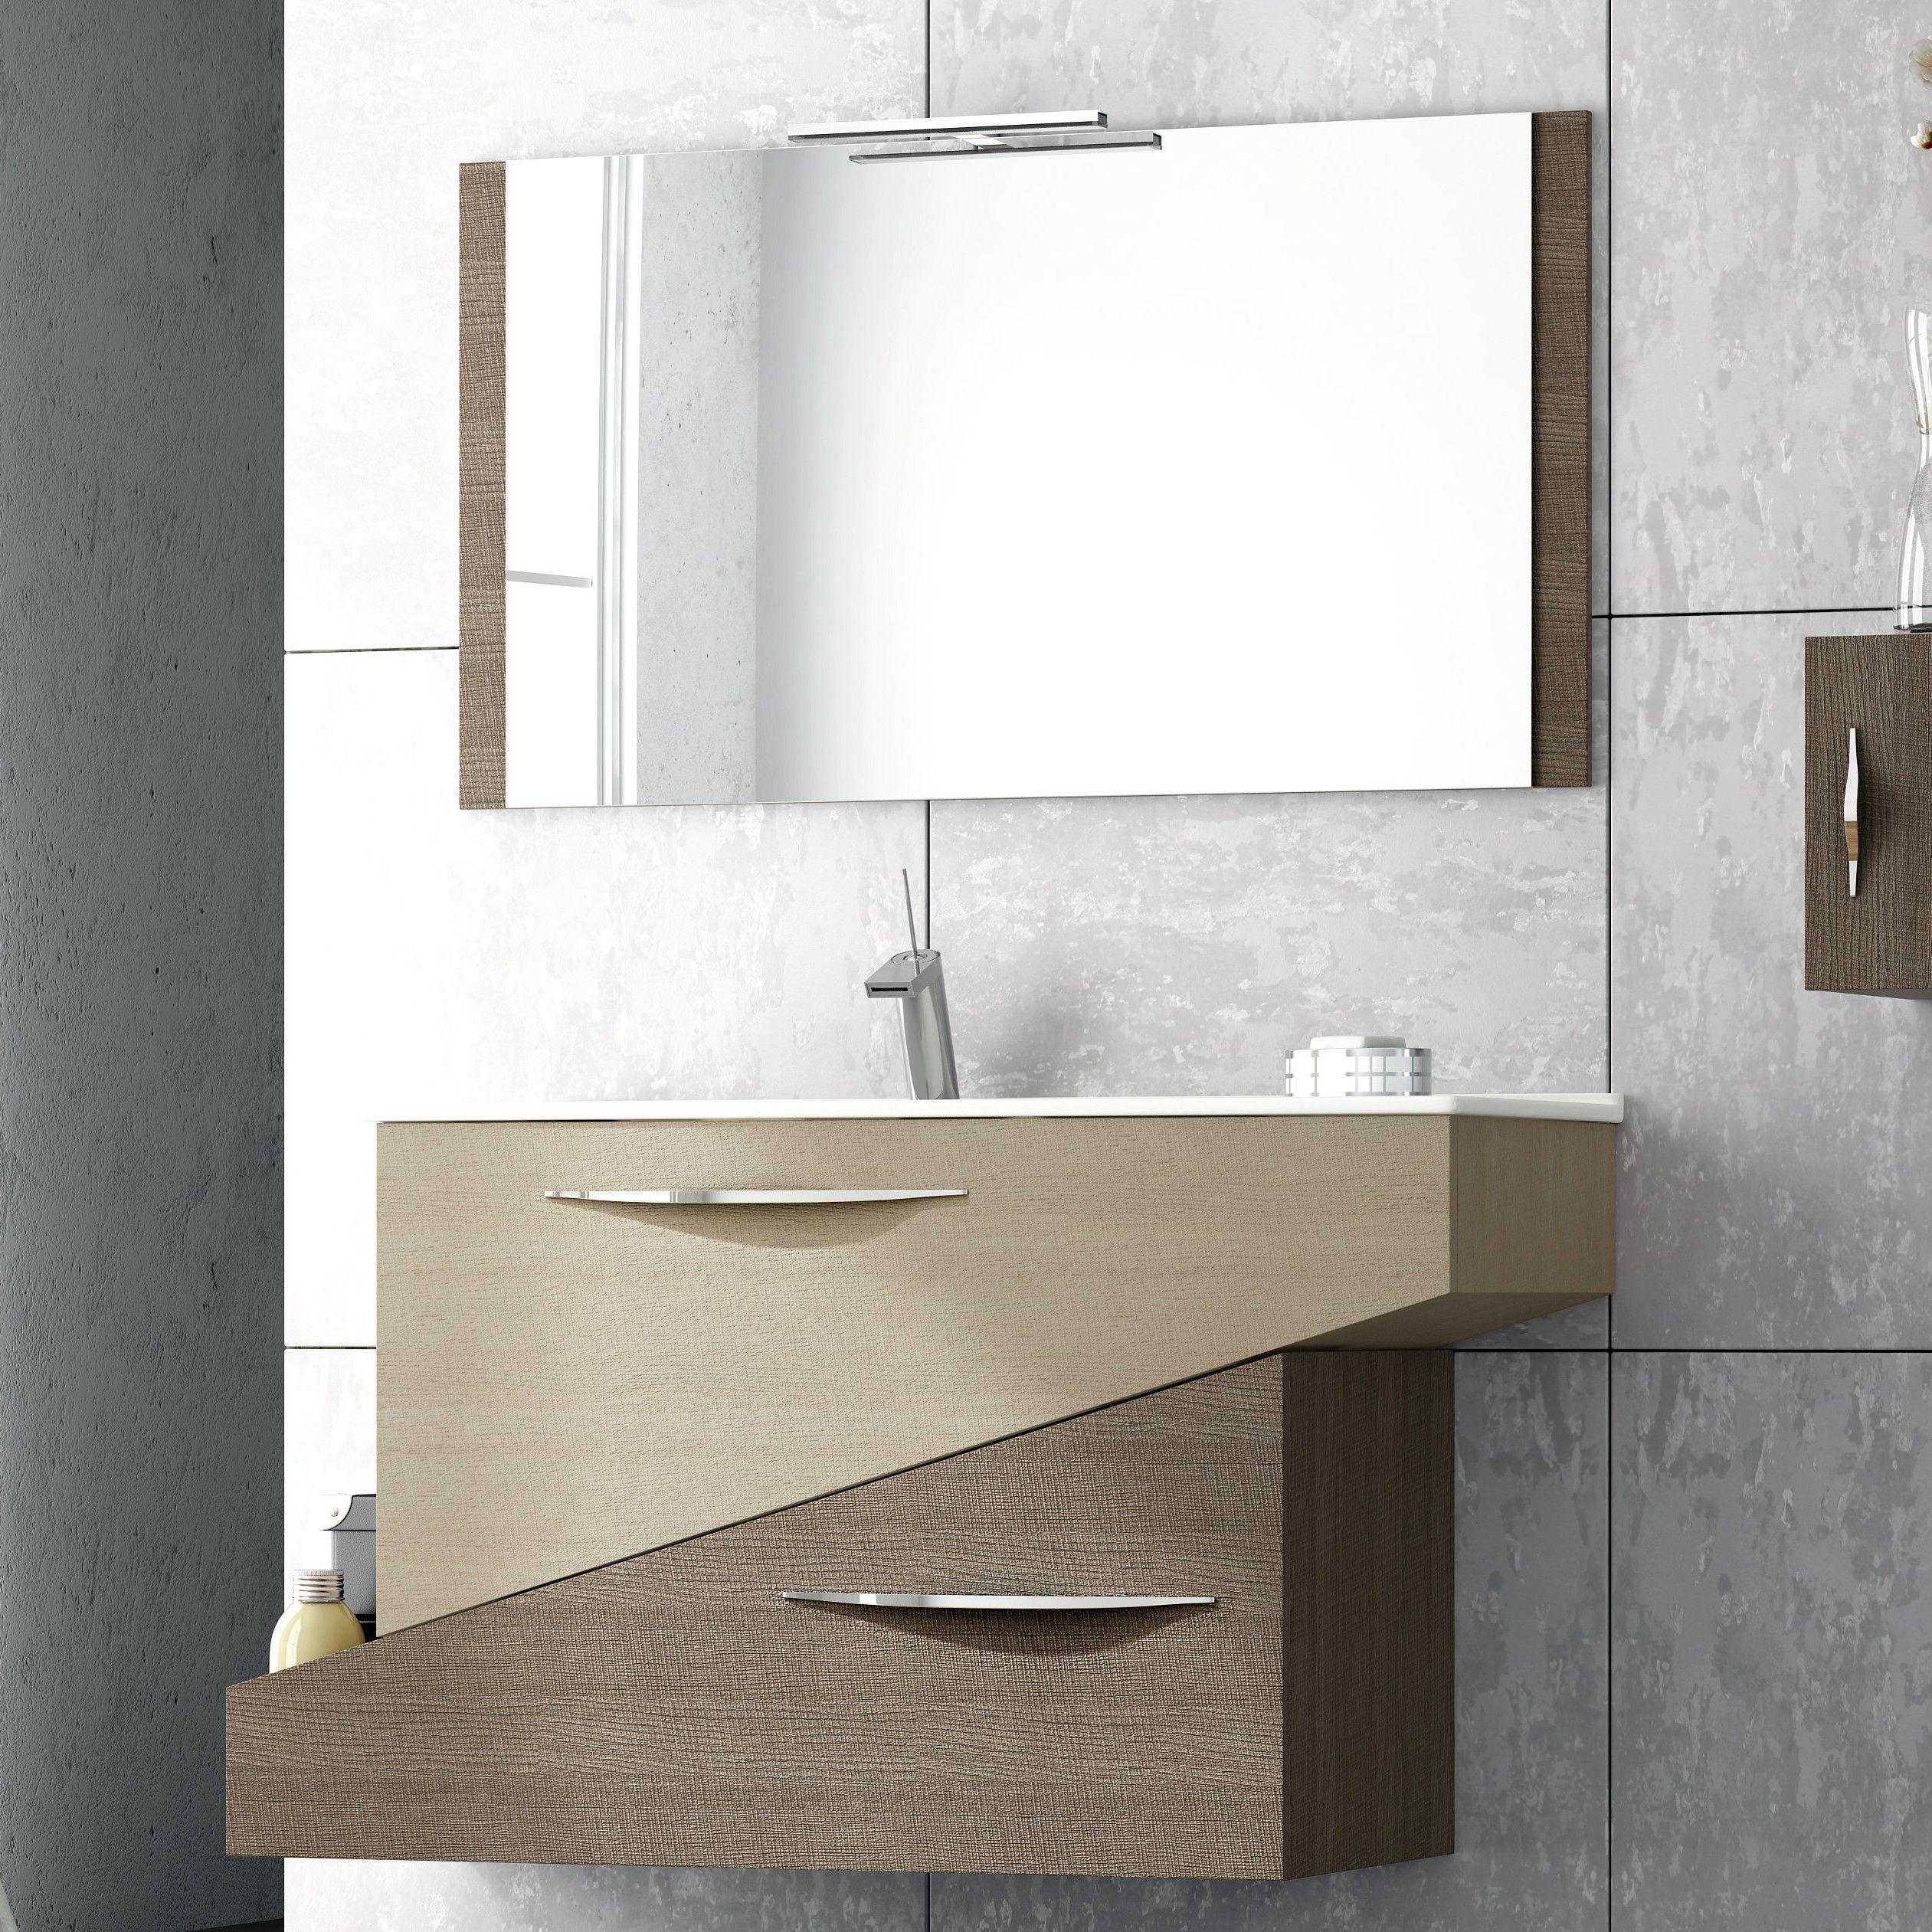 Abella 38 Inch Modern Single Sink Bathroom Vanity Set With Mirror Single Sink Bathroom Vanity Bathroom Sink Vanity Cheap Bathroom Vanities